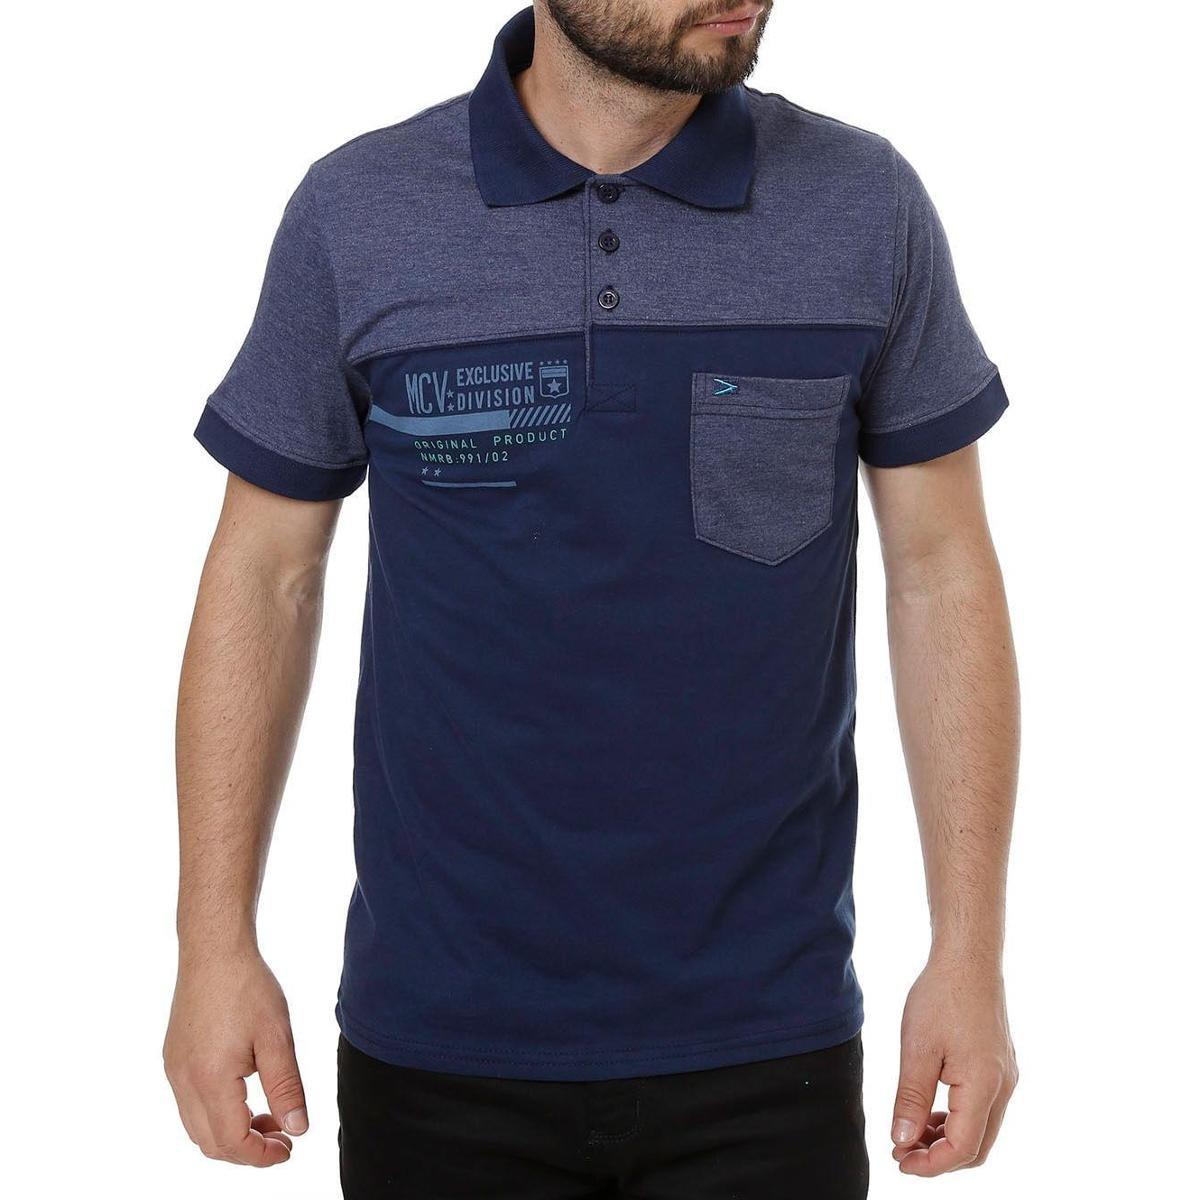 b99e05af93f6e Camisa Polo Manga Curta Masculina - Marinho